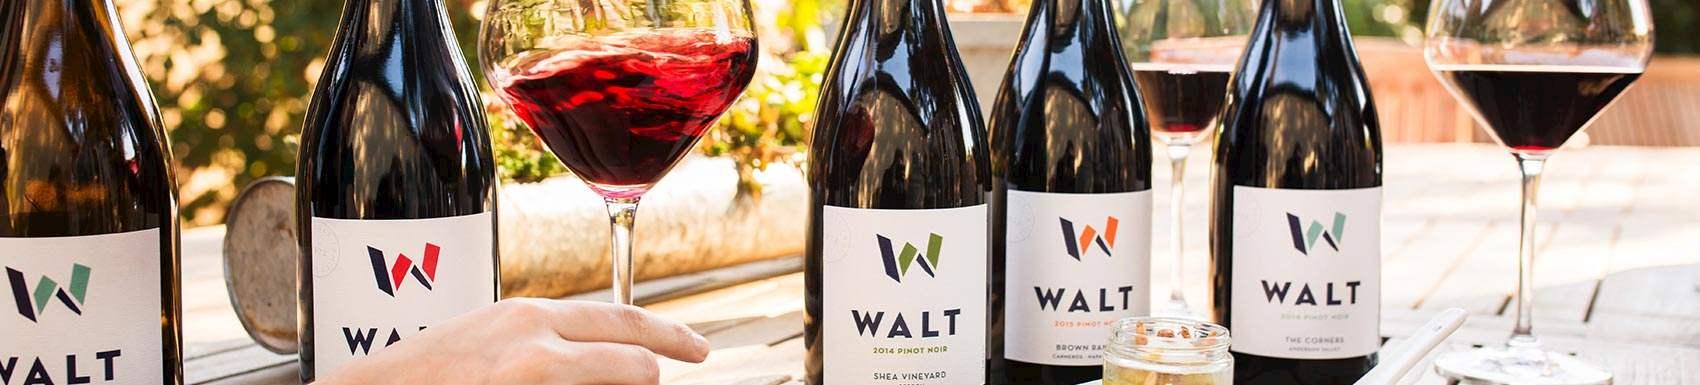 WALT - Sonoma in Napa, California